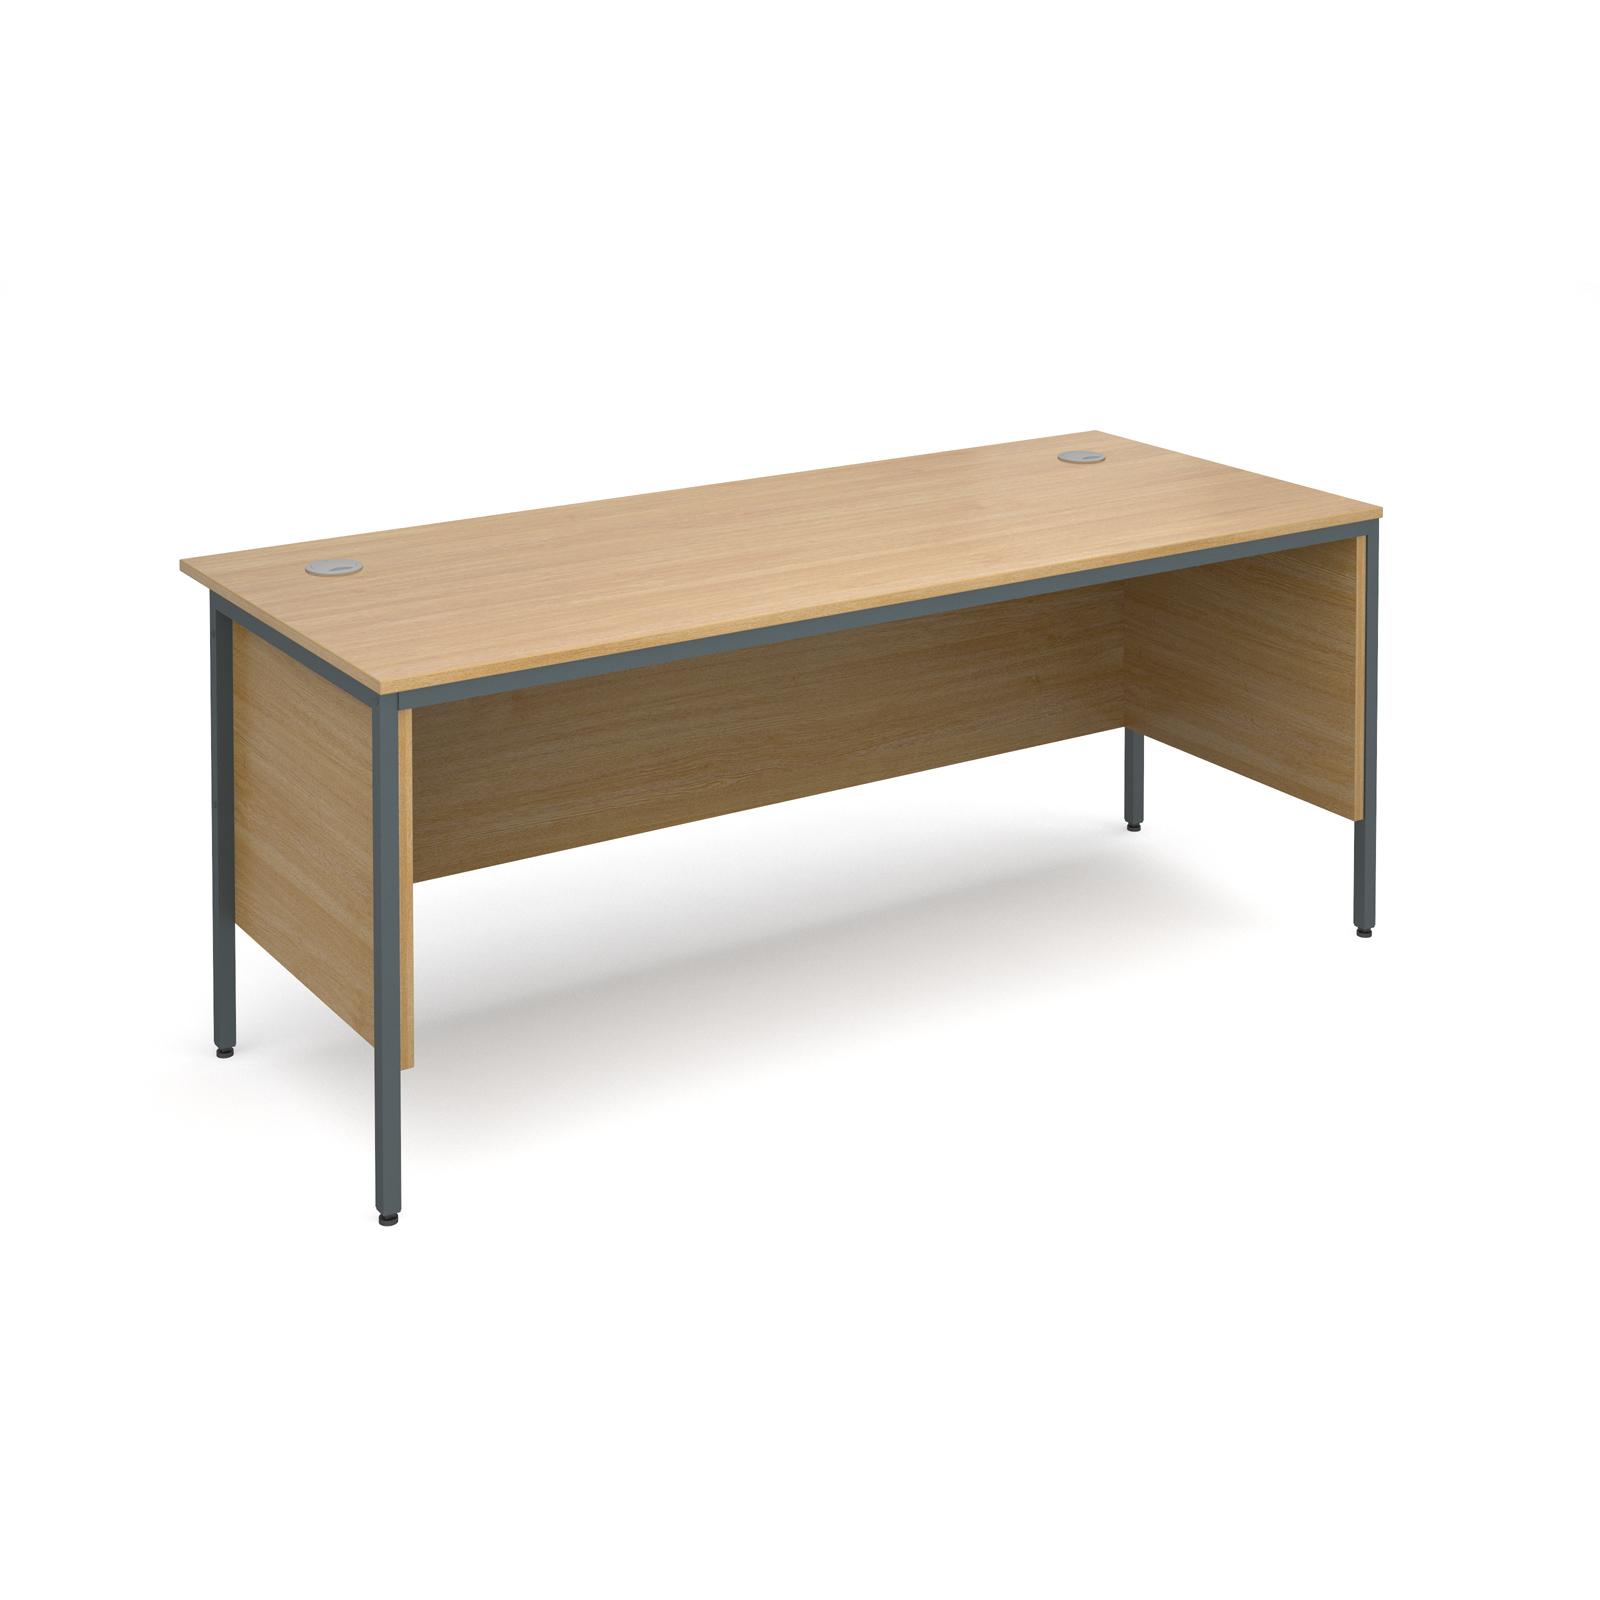 Maestro H frame straight desk with side panels 1786mm - oak